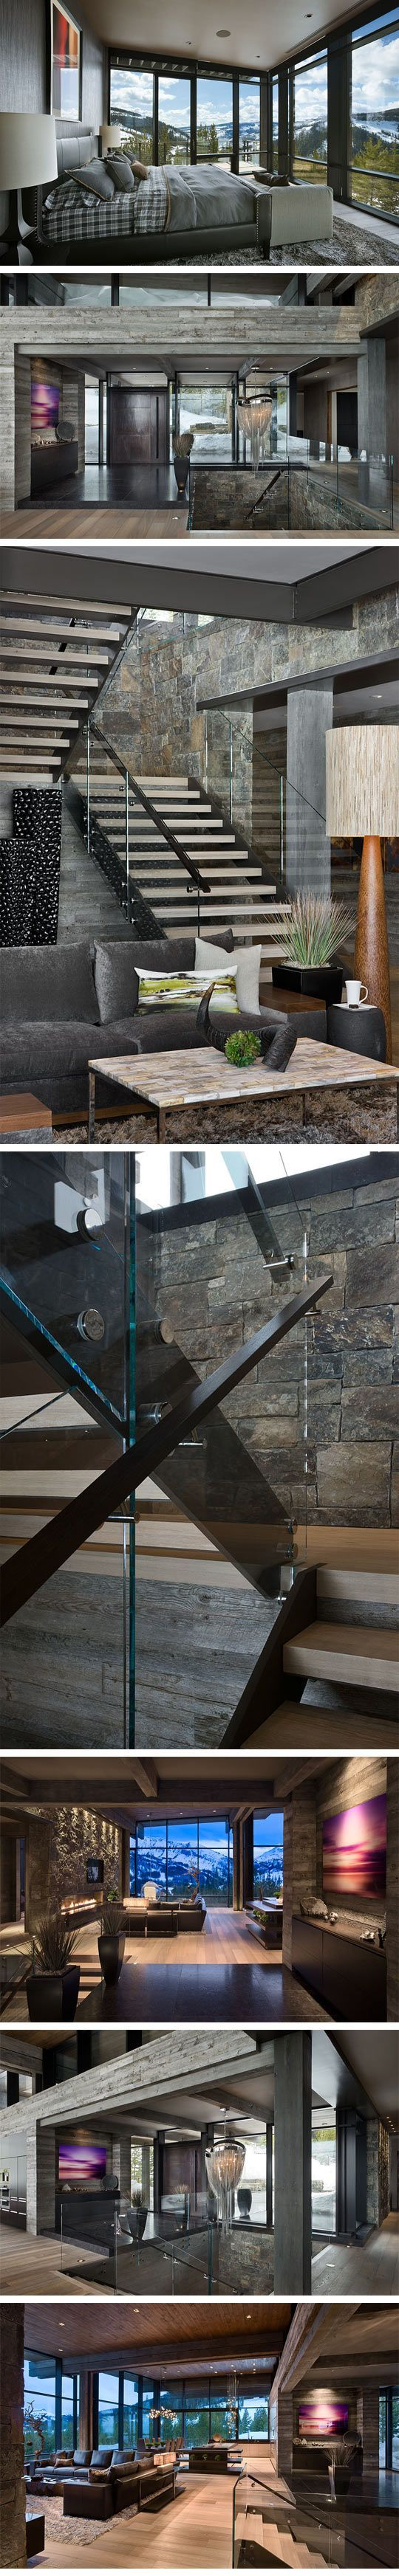 Luxury home design enhancing natural stones